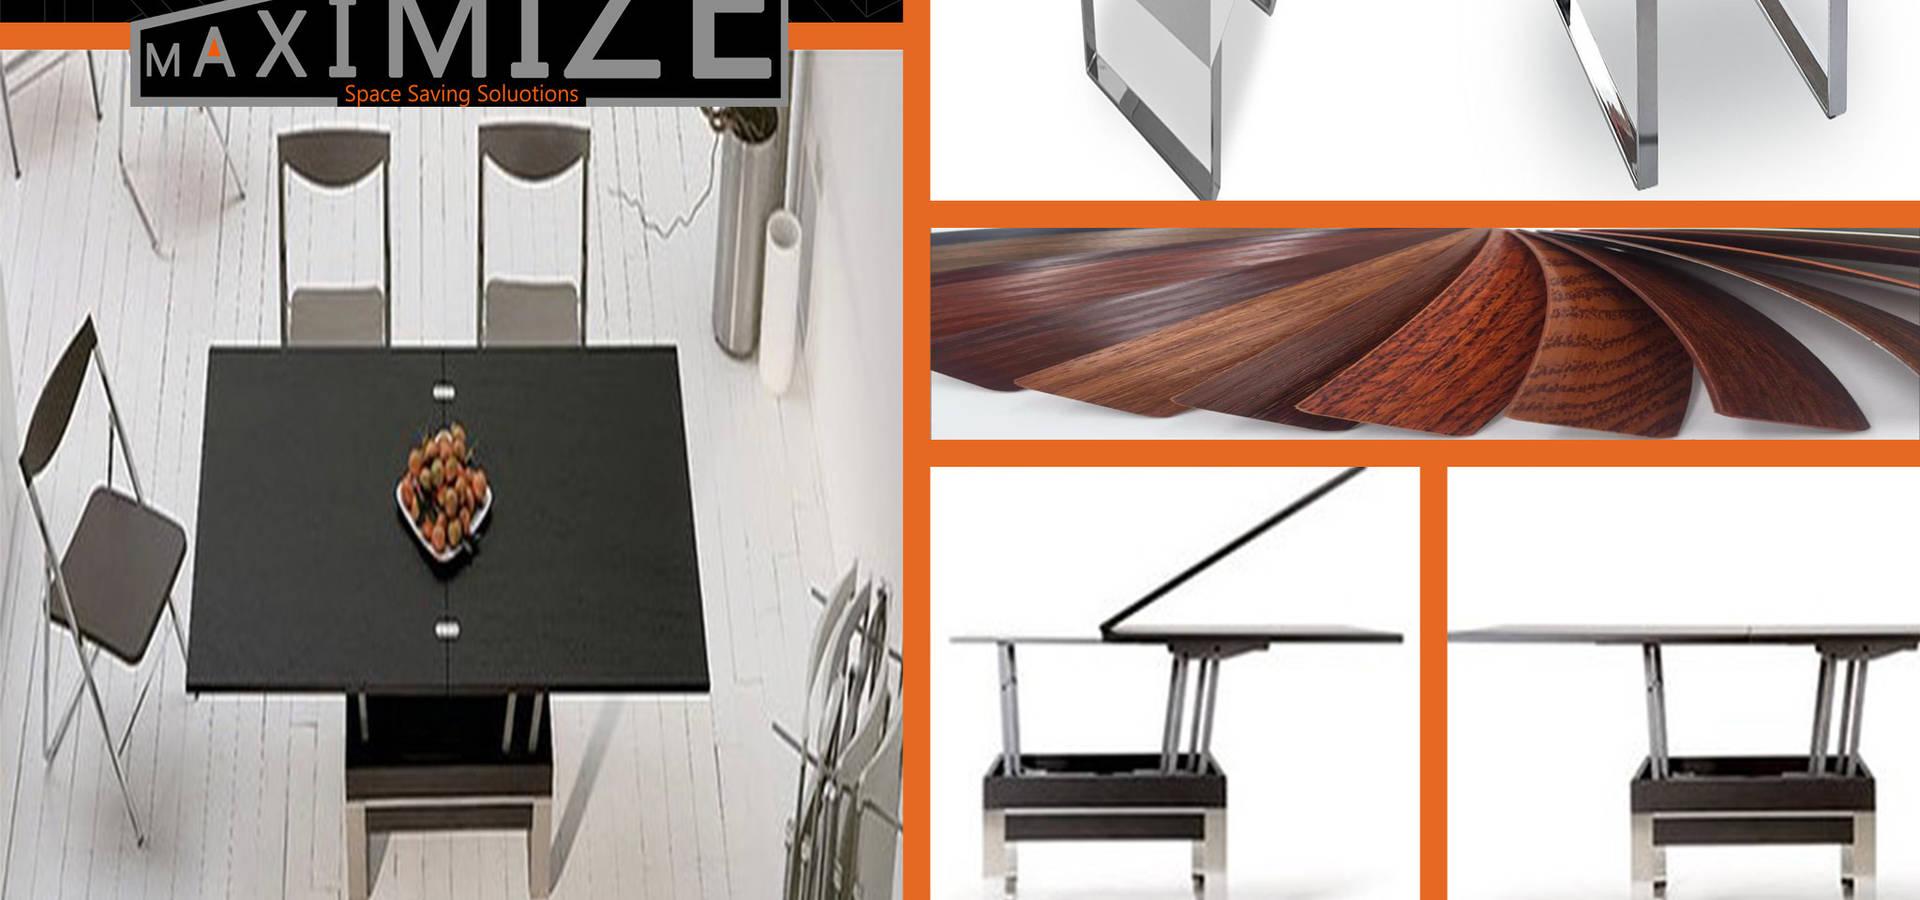 Maximize Design